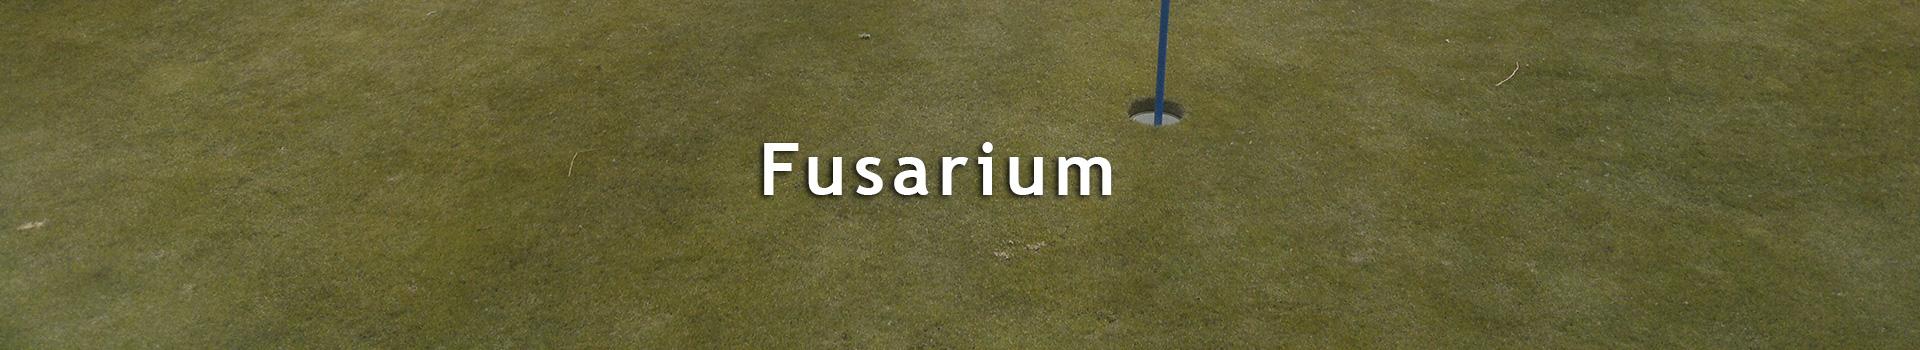 TourTurf<sup>®</sup> FDC Autumn + R-Factor<br>EU: 5-0-0